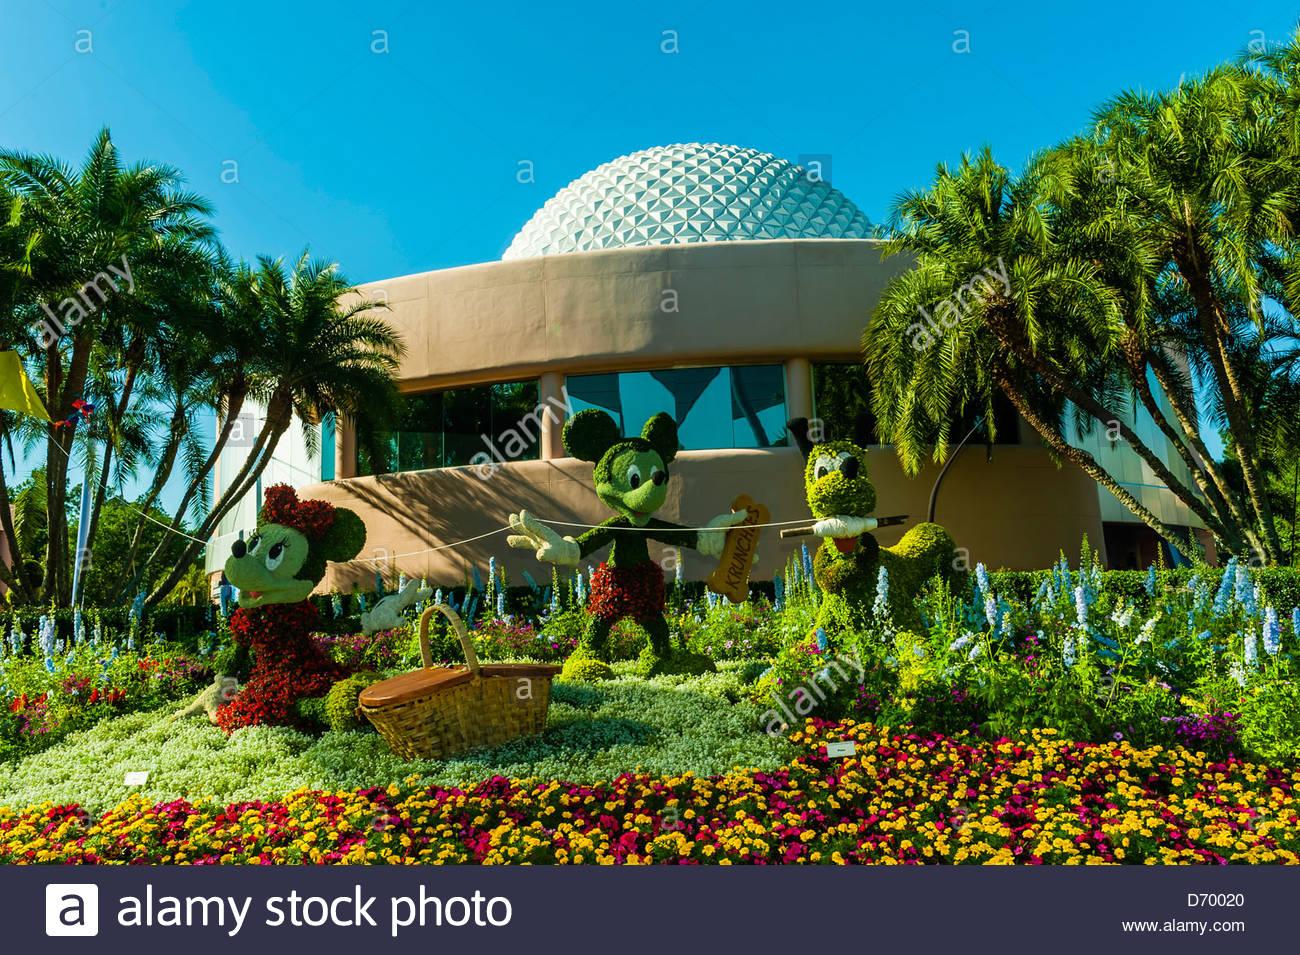 Pluto disney stock photos pluto disney stock images alamy for Disney flower and garden festival